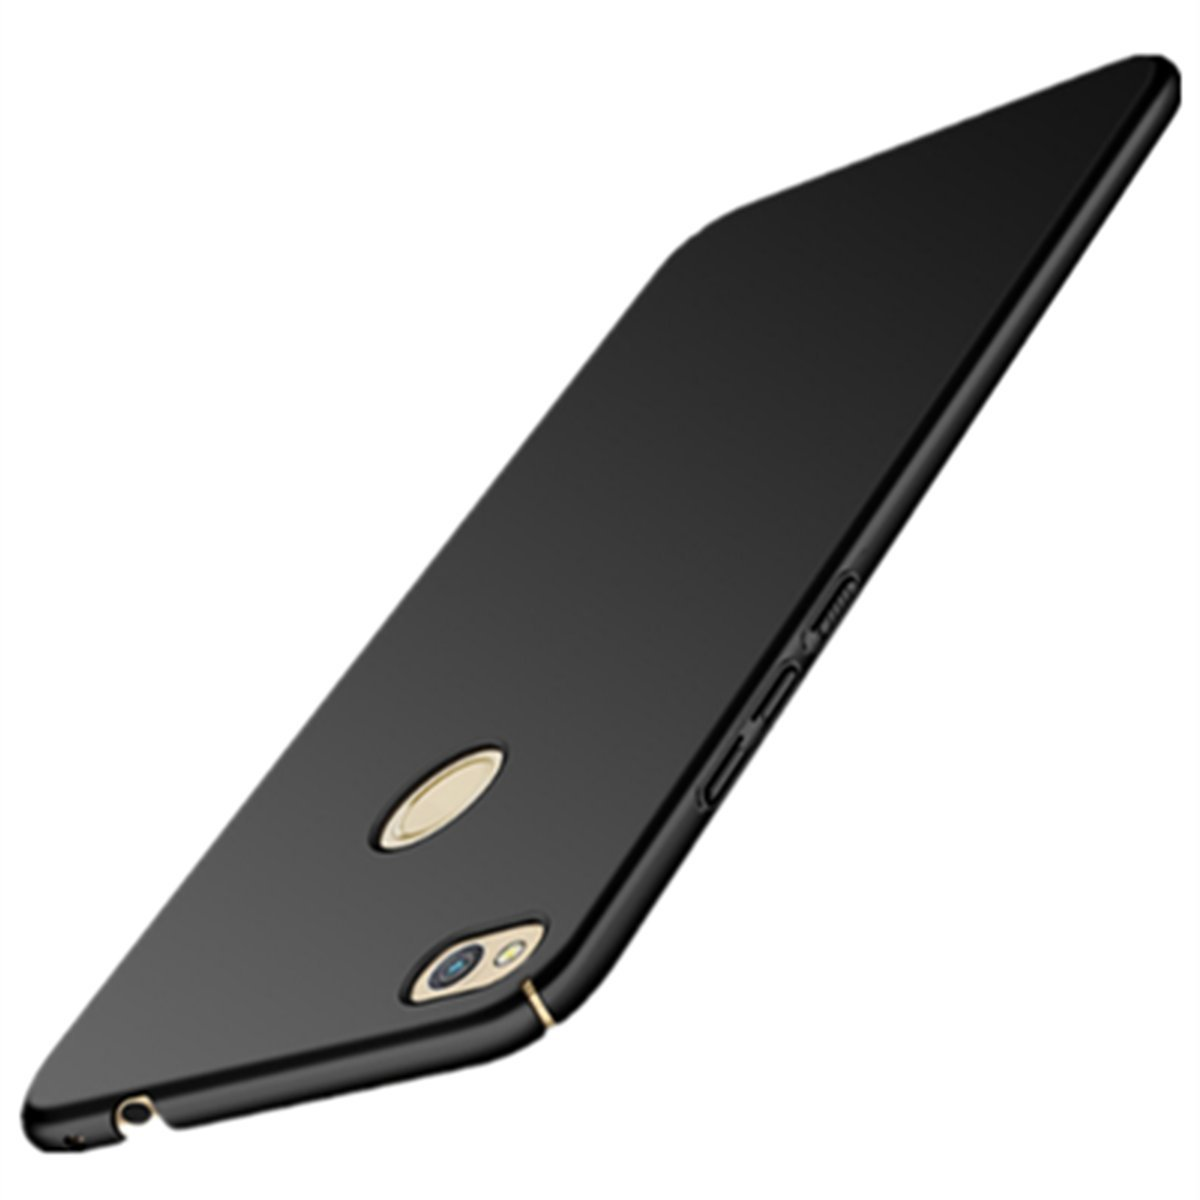 Vanki Custodia per Huawei P8 Lite 2017, Ultra sottile Dura PC Ultra Sottile Placcatura Anti-Scratch Protettiva Bumper Cover Case per Huawei P8 lite 2017 argento) VITLM-MSXK03